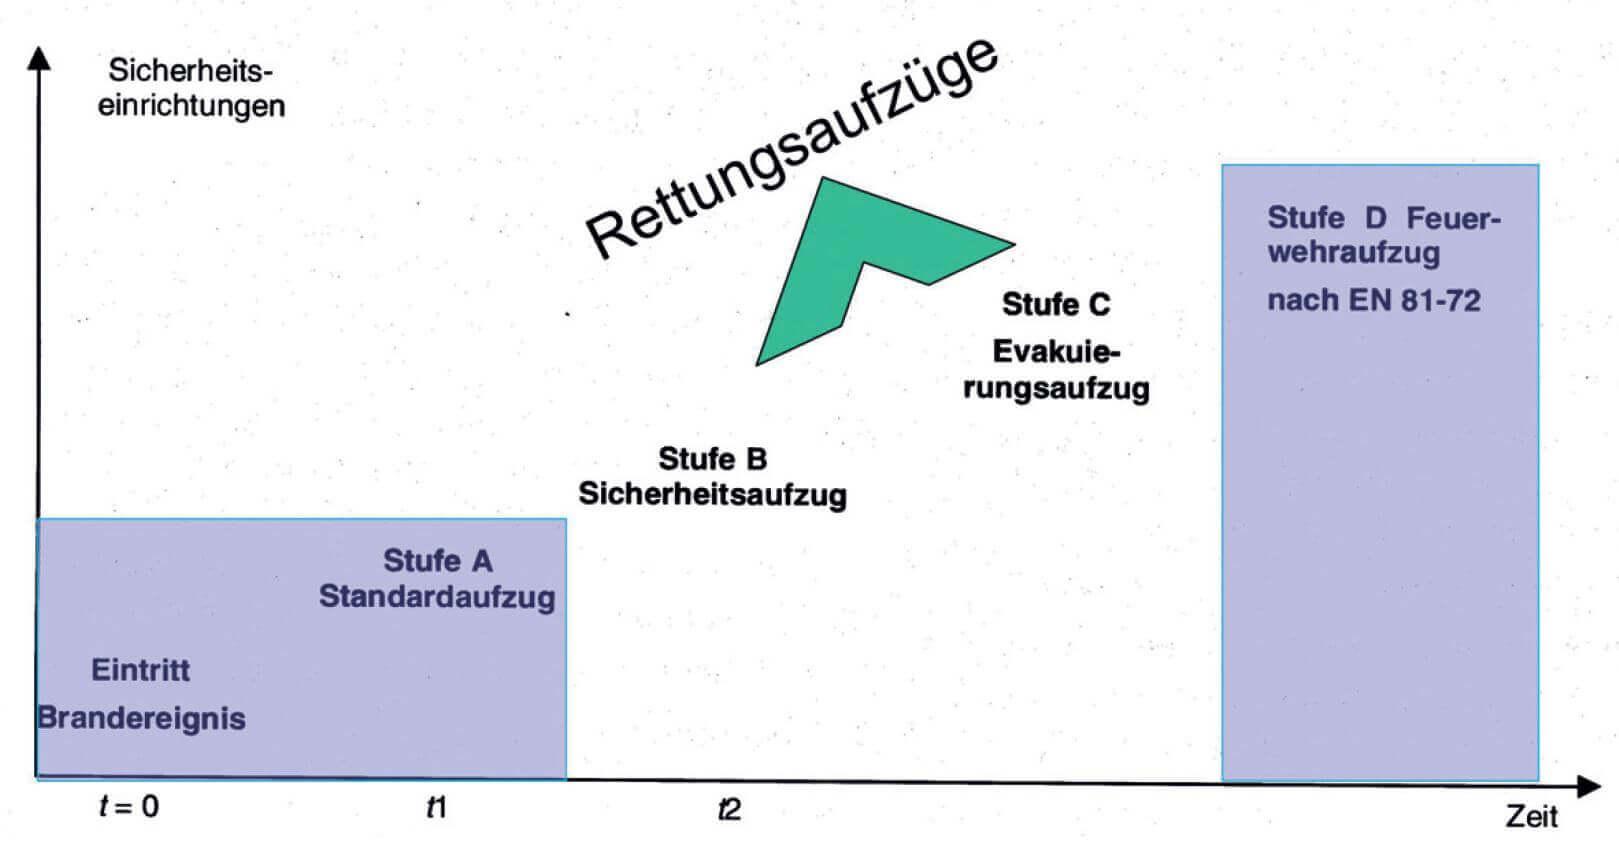 Rettungsaufzug-VDI-6017-Forum-Verlag-Herkert-GmbHG3GfyZOkIqytX